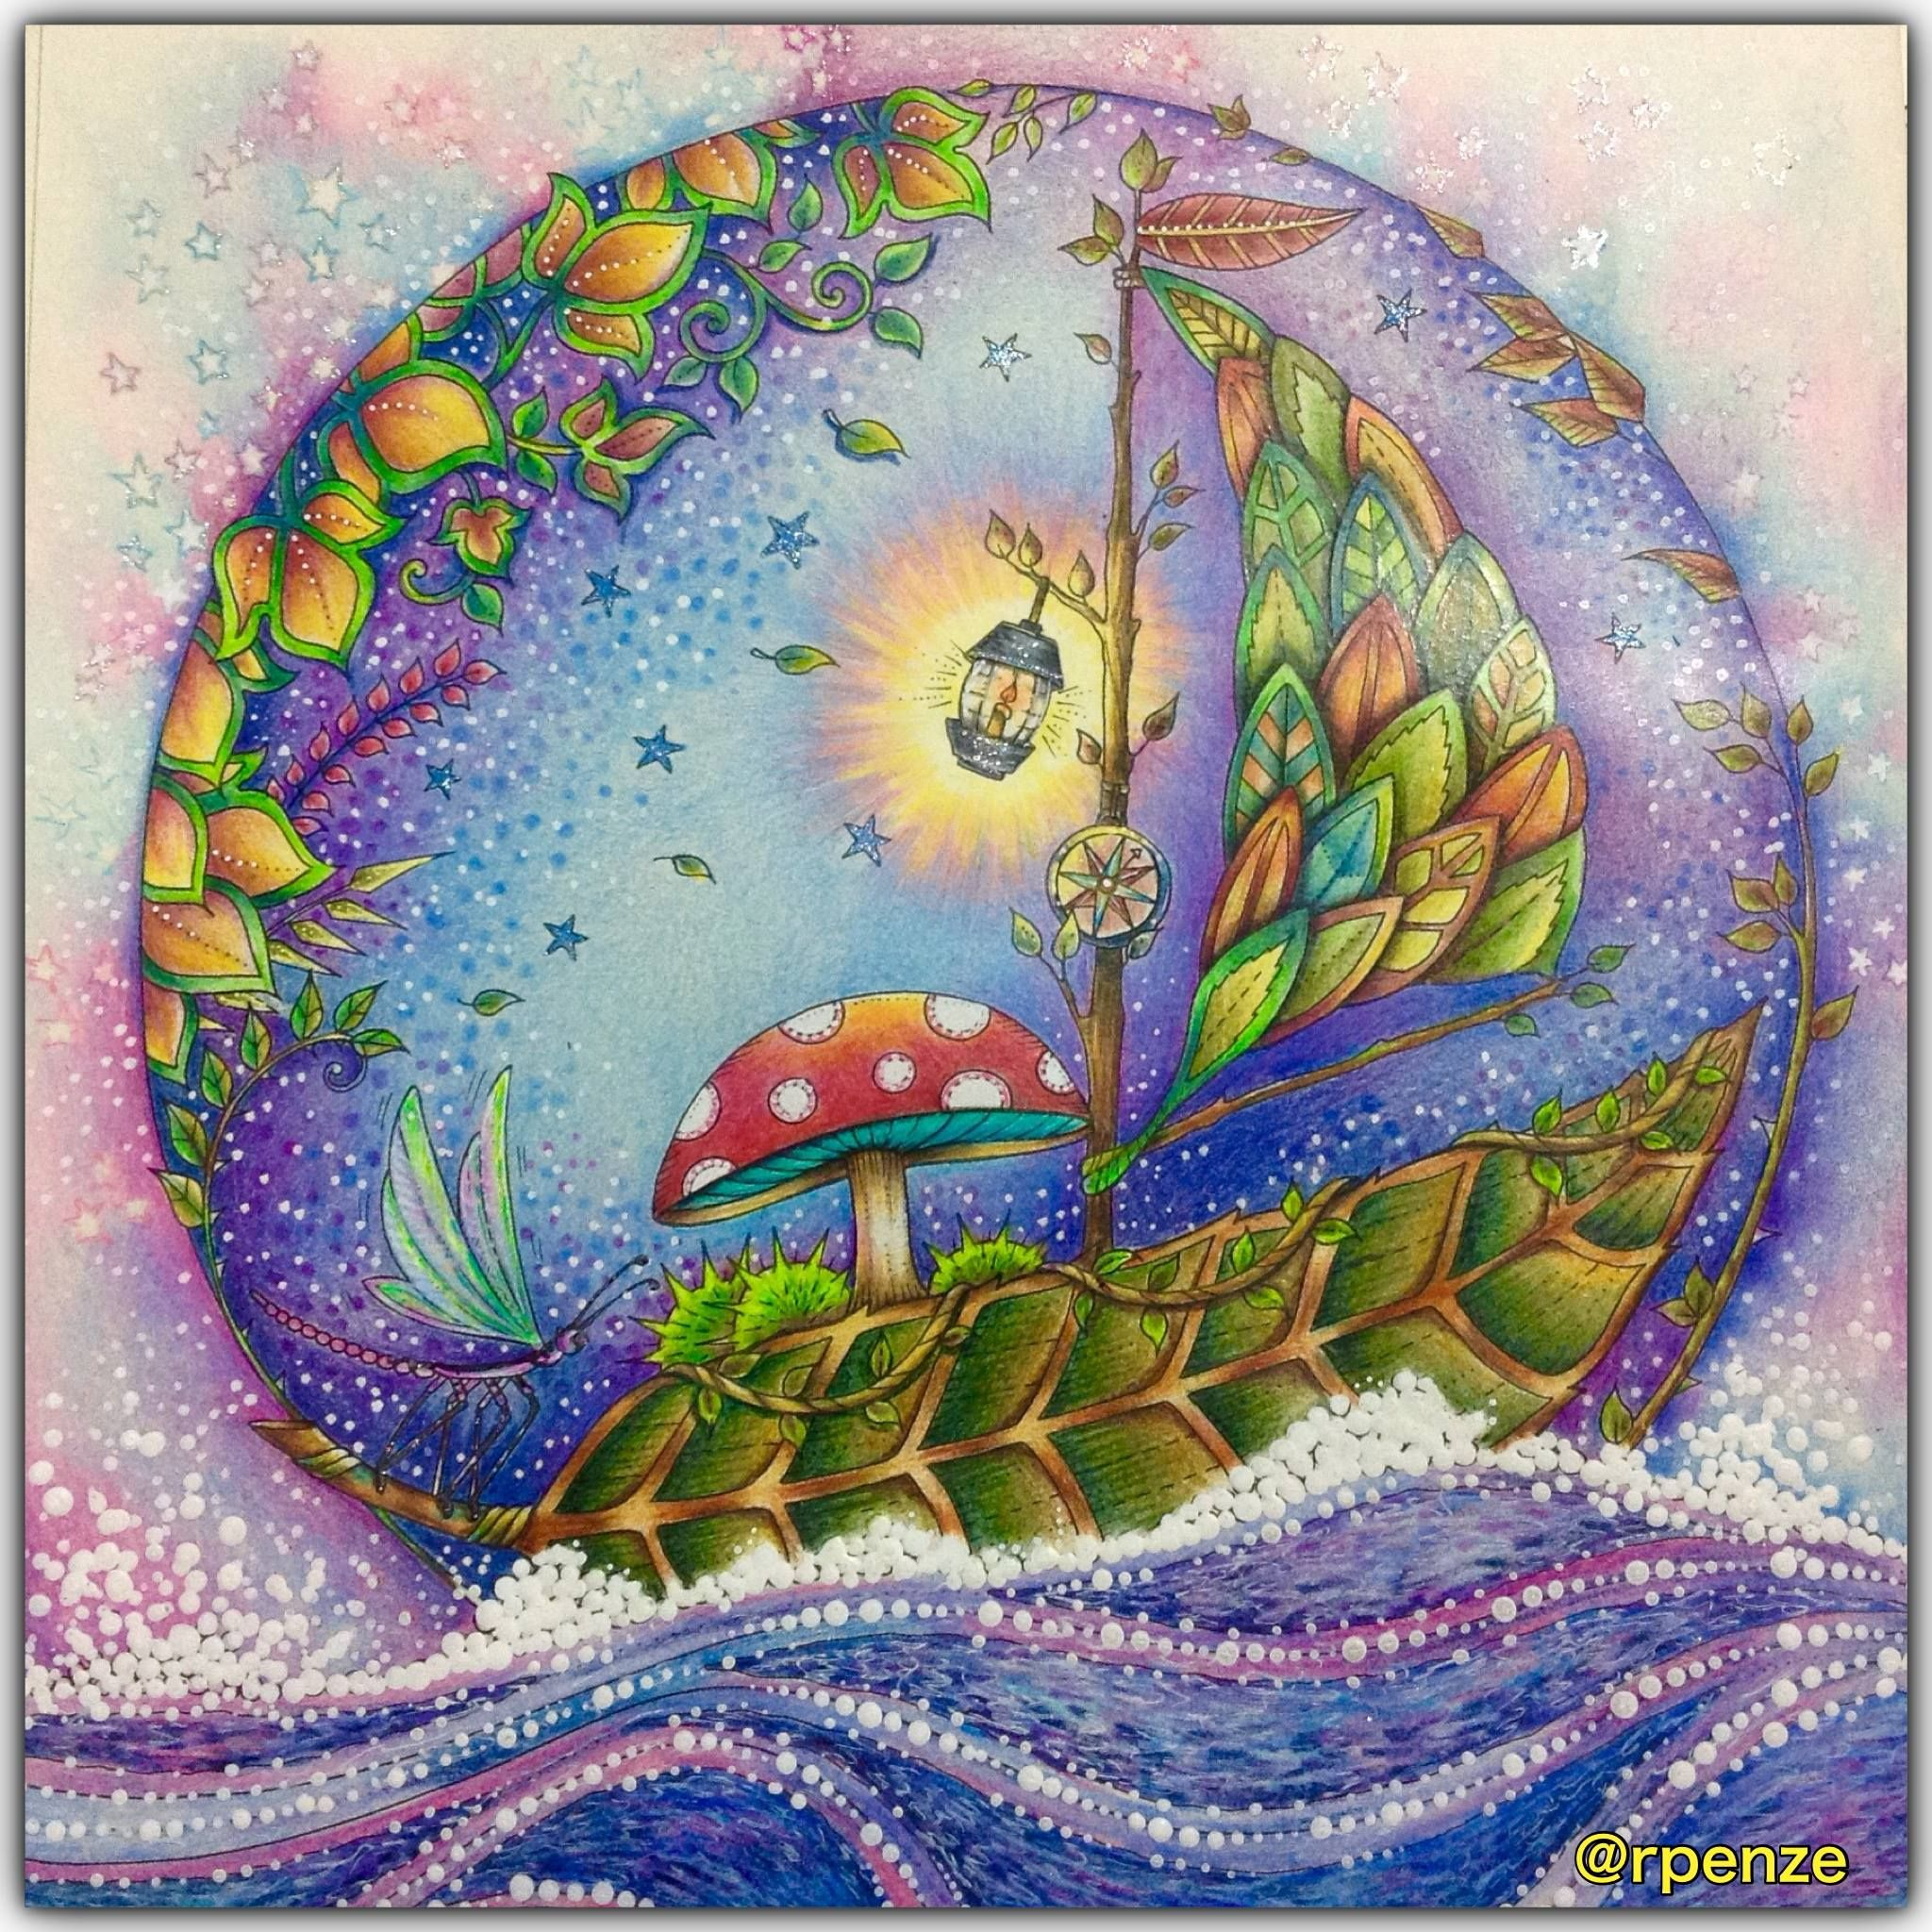 Zendoodle coloring enchanting gardens - Enchanted Forest Coloring Book Rosana Penze